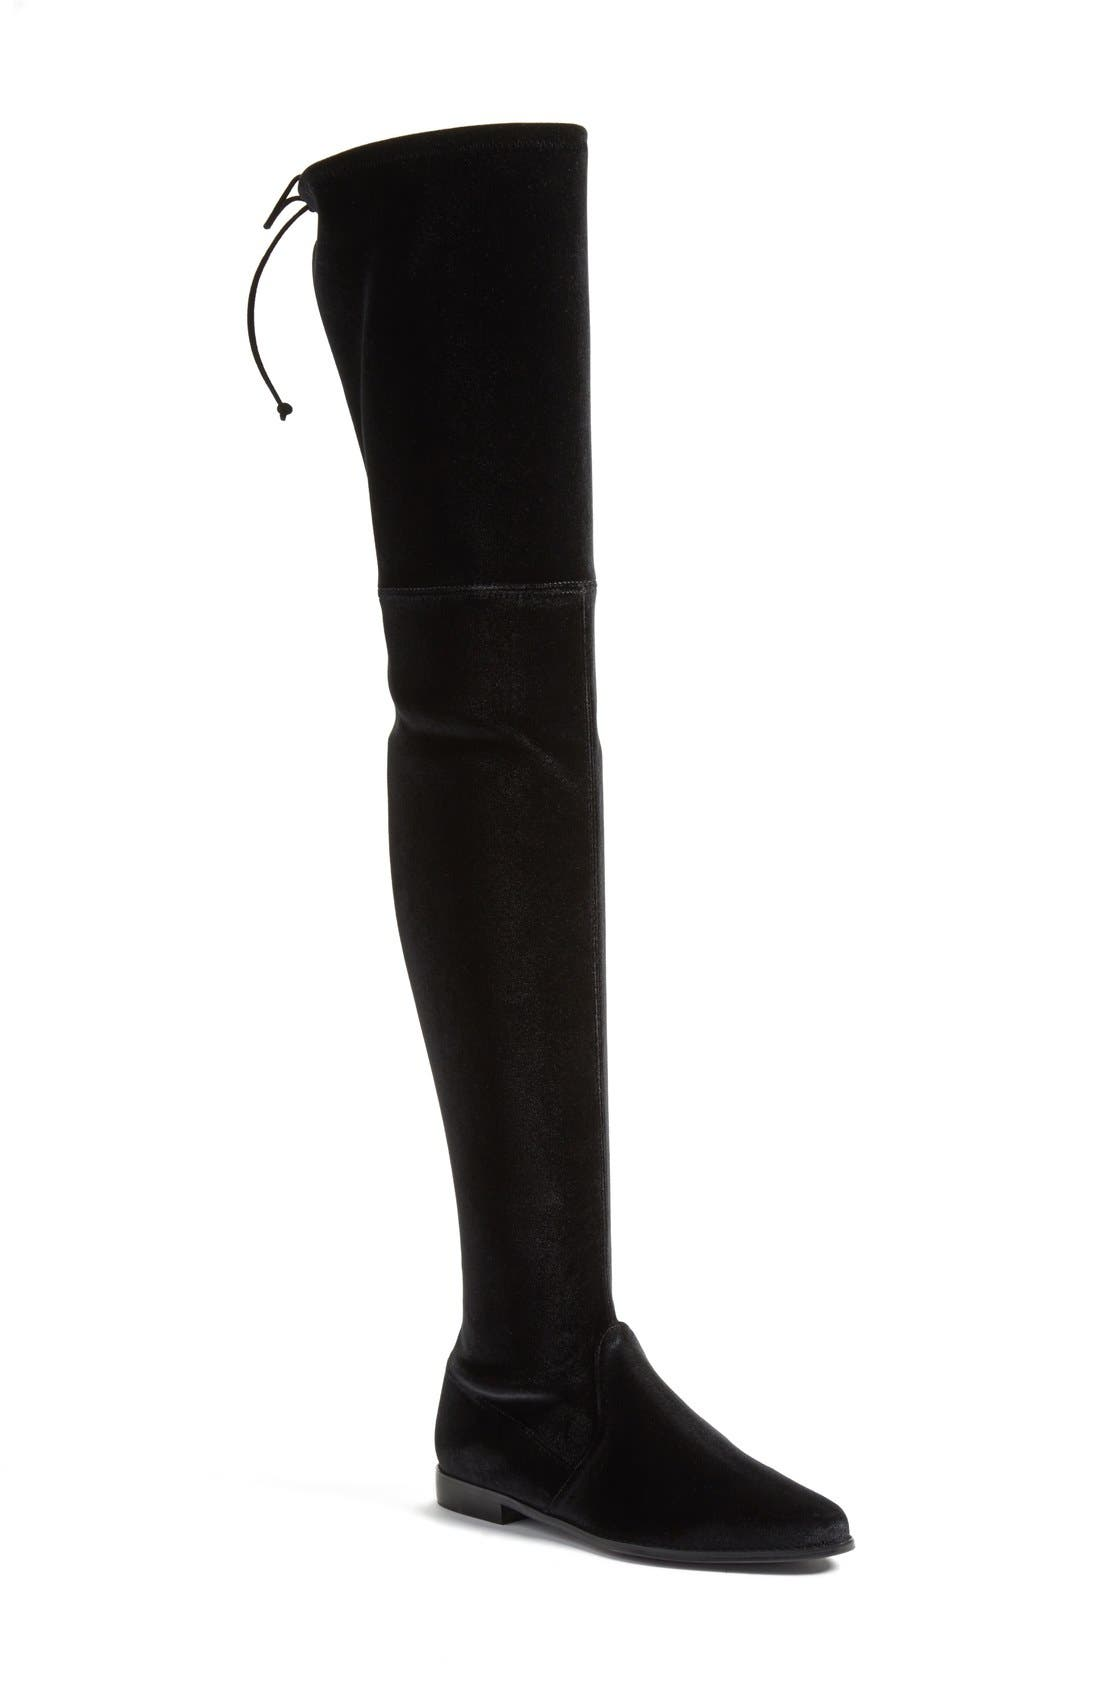 Main Image - Stuart Weitzman 'Leggylady' Over the Knee Boot (Women)